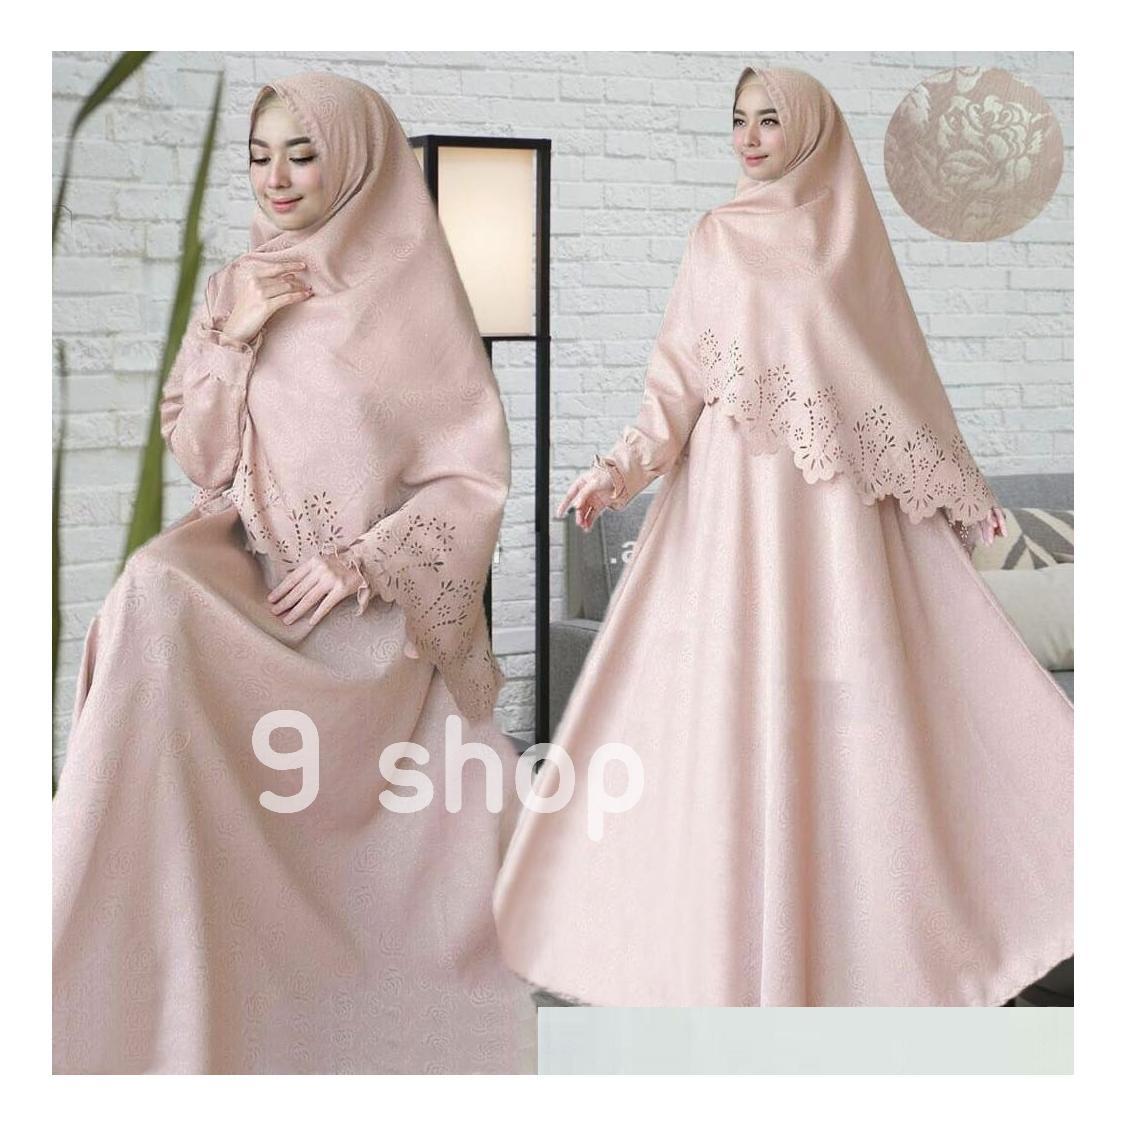 Cek Harga Baru 9 Shop Baju Gamis Syari Dress Maxi Muslim Wanita